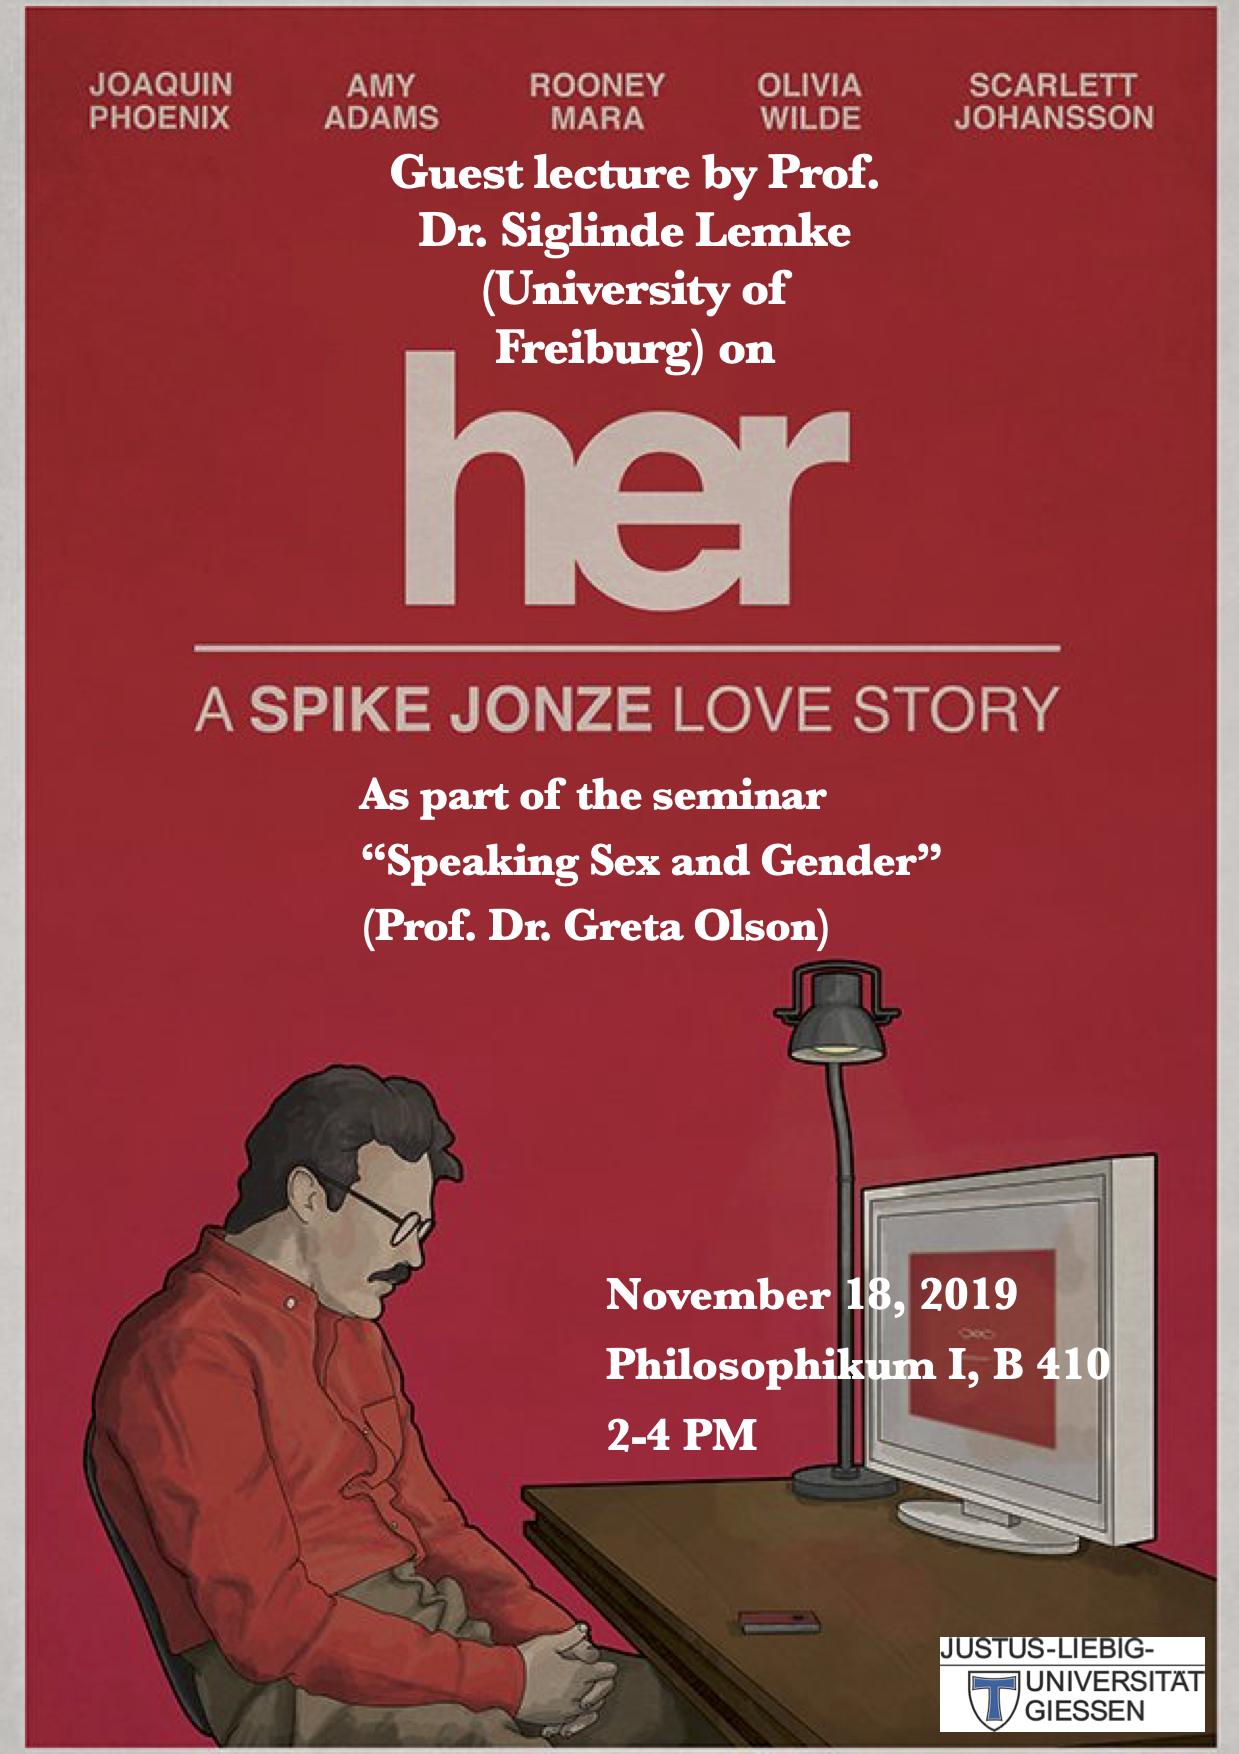 Lemke guest lecture poster